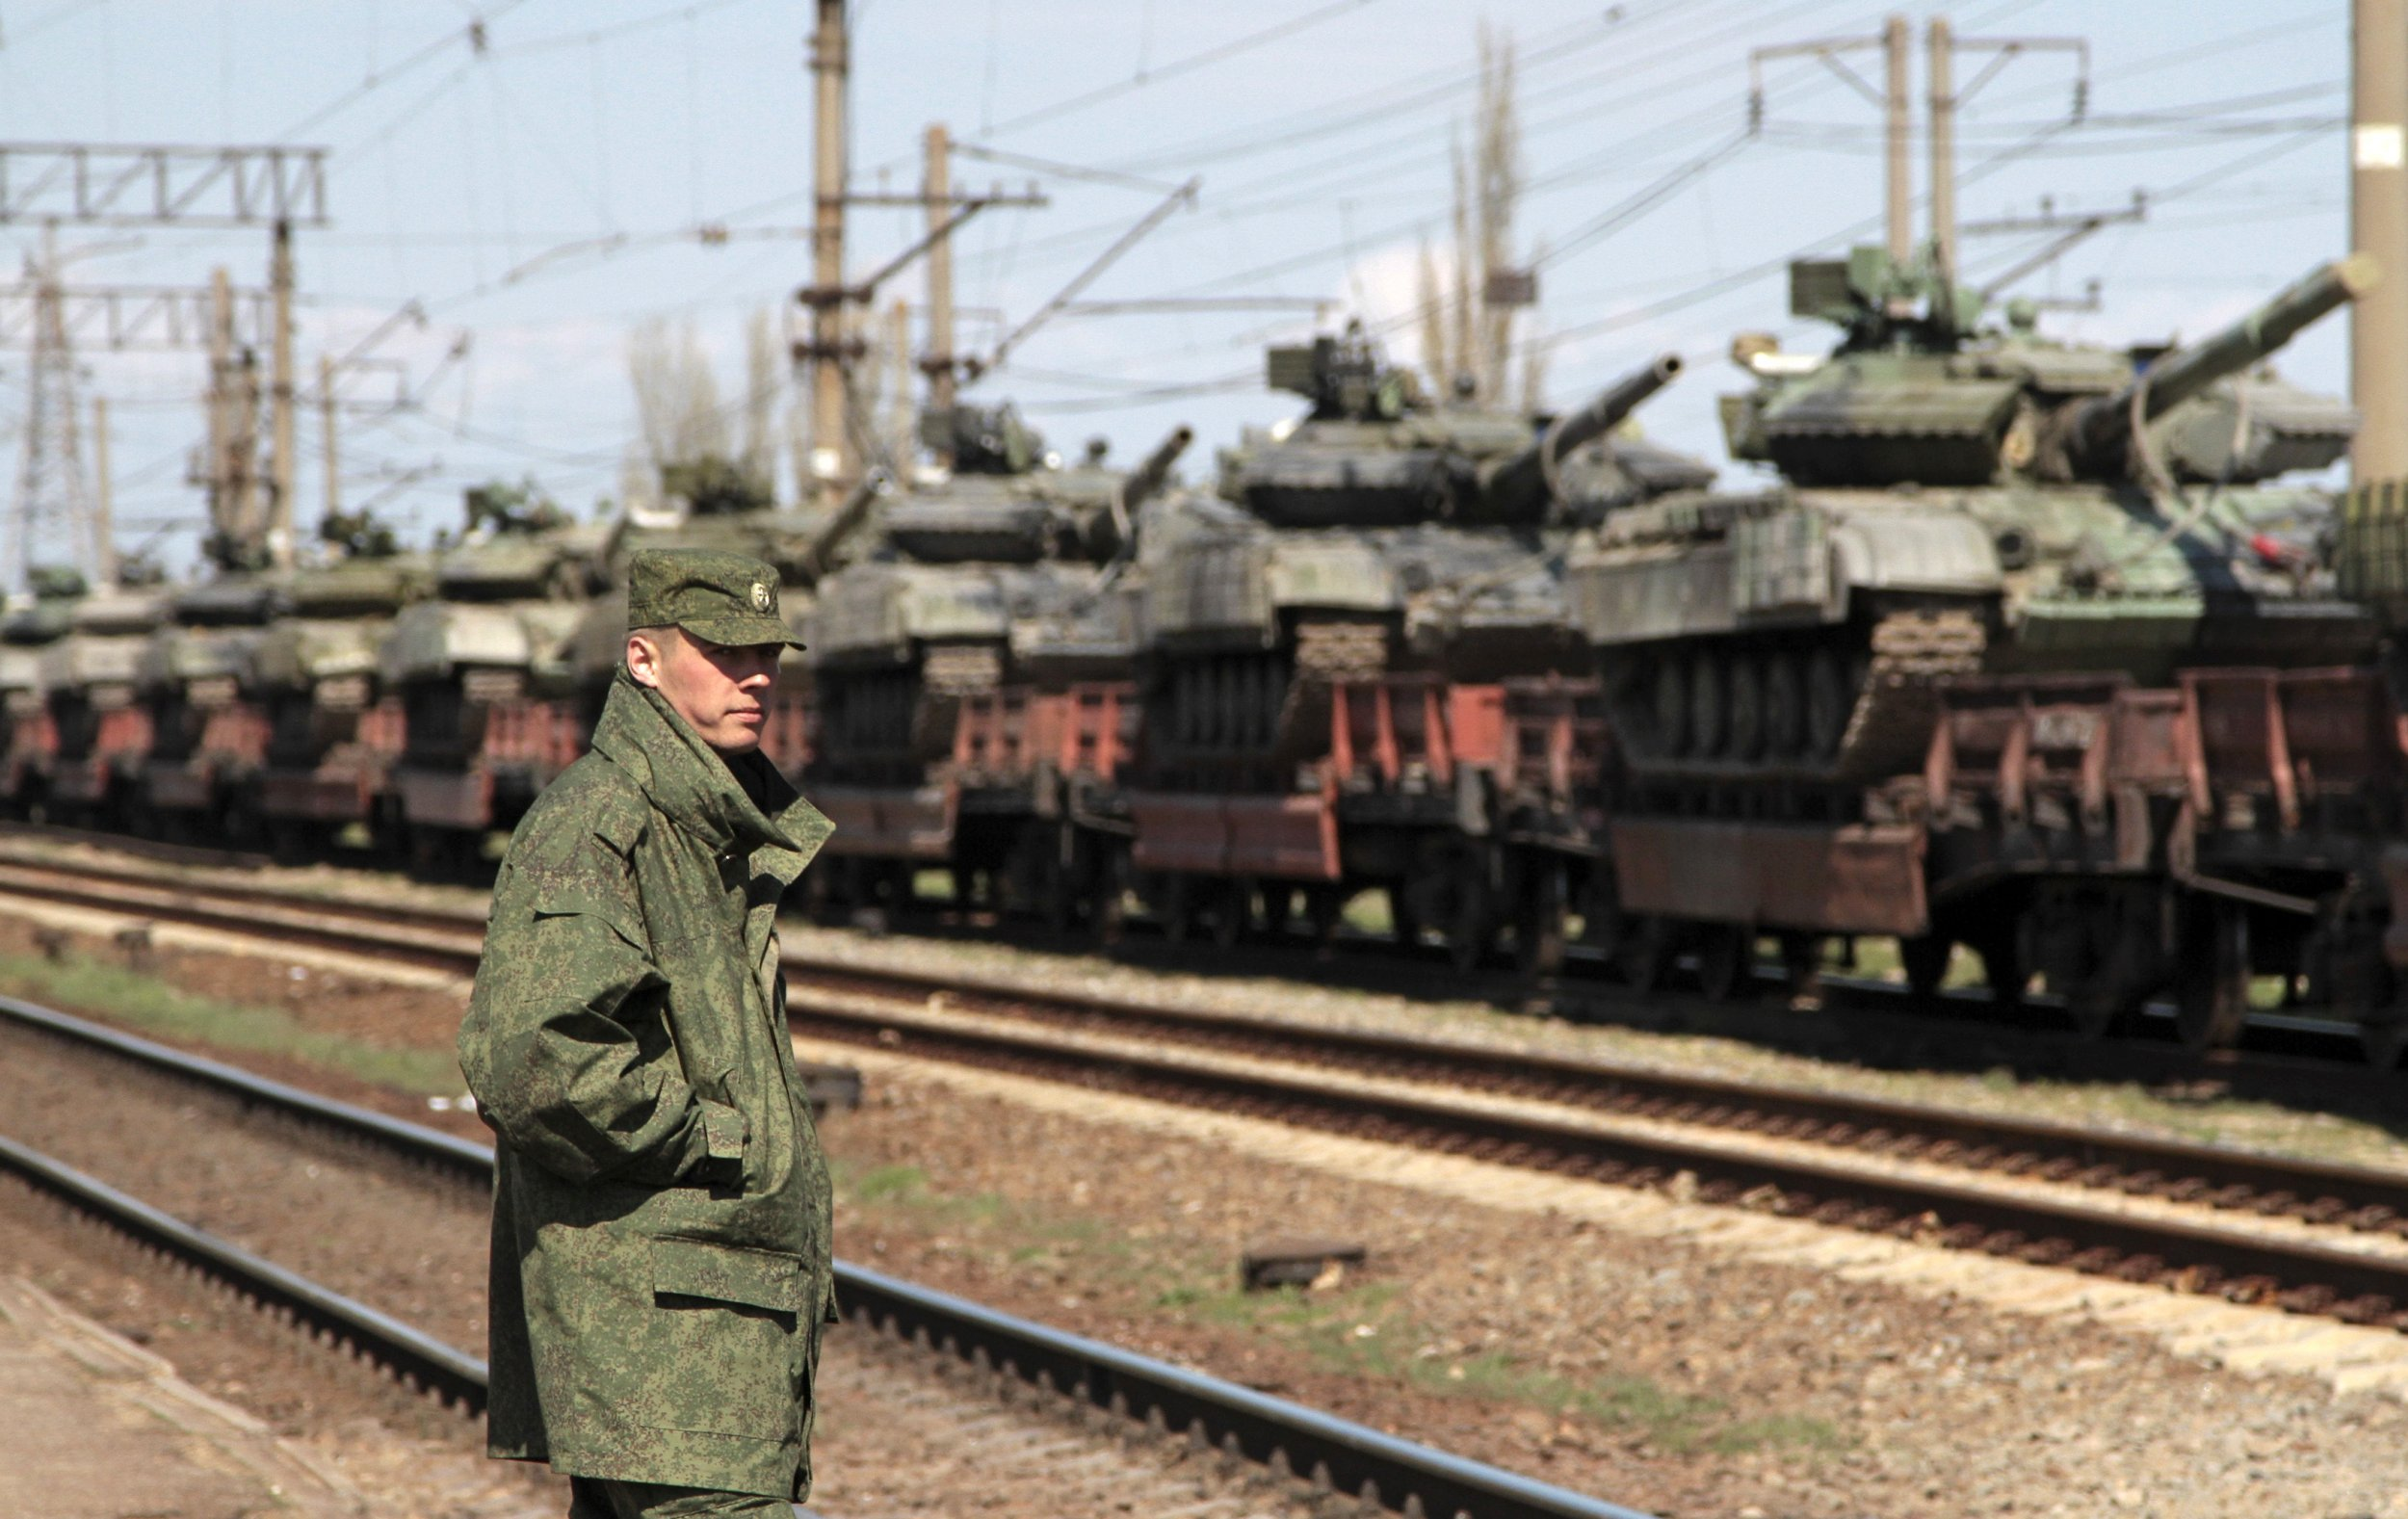 http://s.newsweek.com/sites/www.newsweek.com/files/styles/headline/public/2014/03/31/russian-tanks_0.jpg?itok=8hSc1wfO